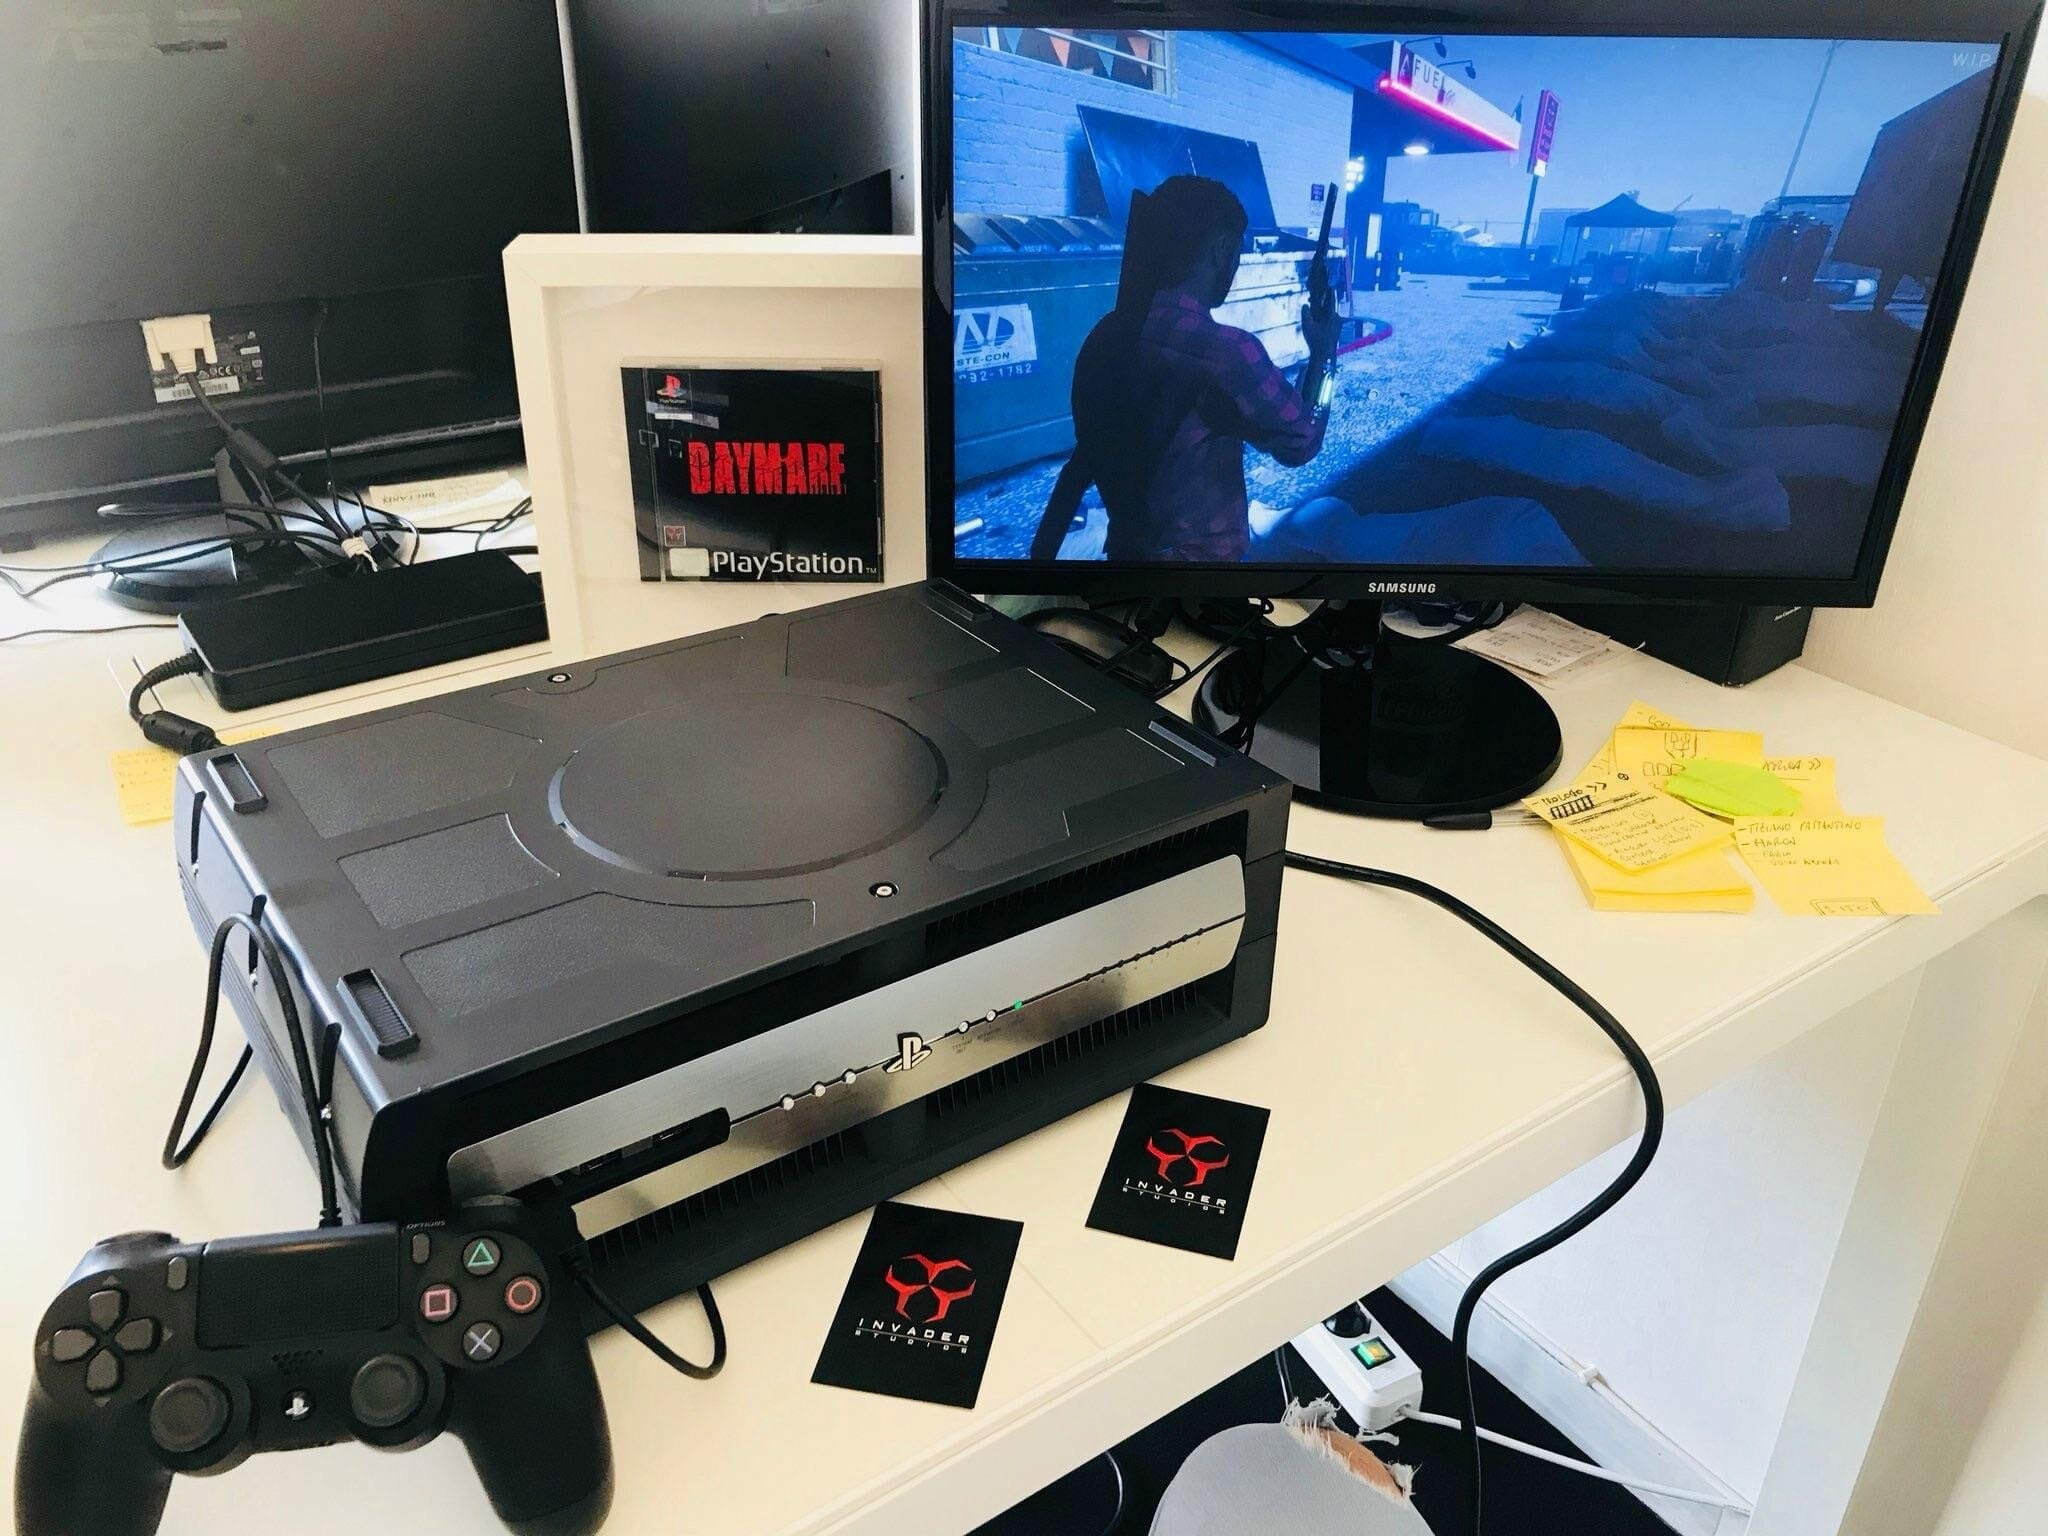 PlayStation 5 Development Kit